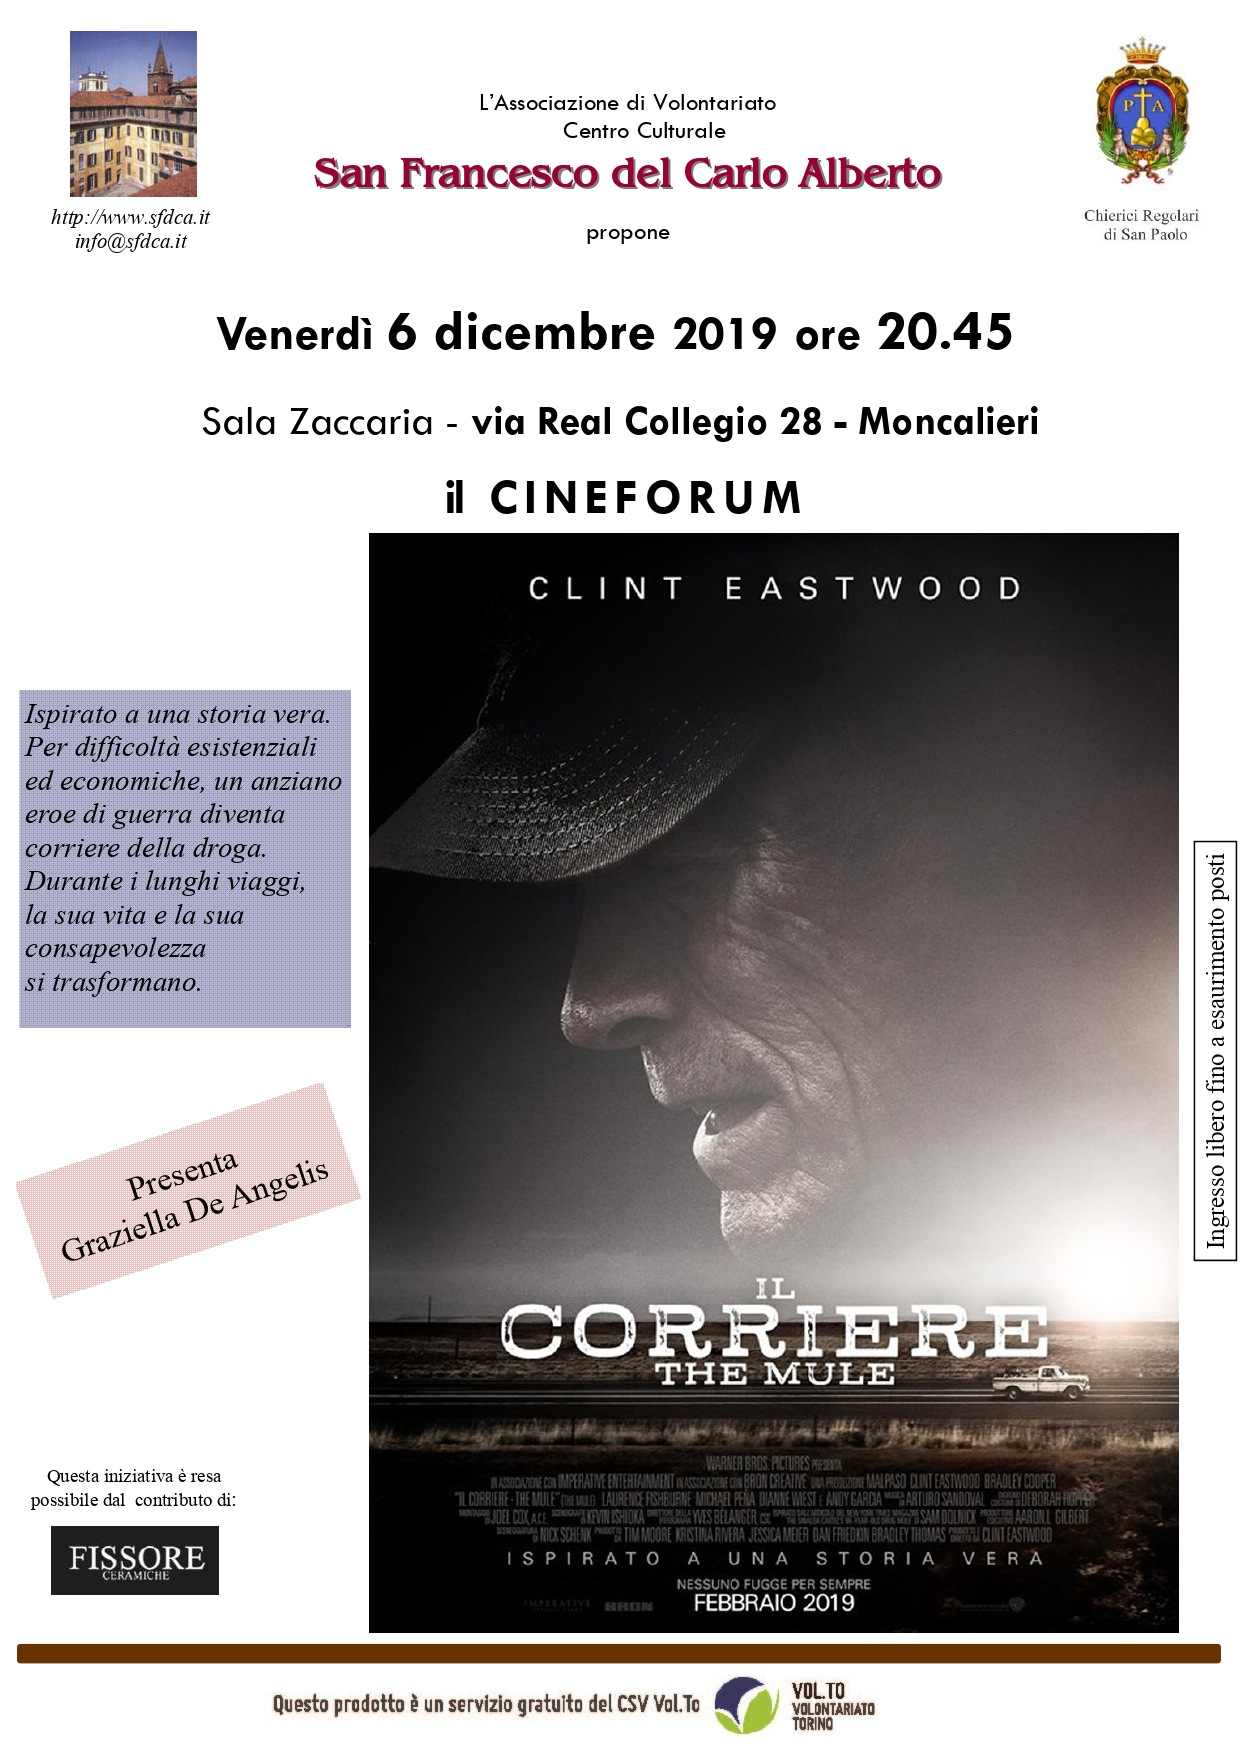 CINEFORUM - IL CORRIERE - THE MULE